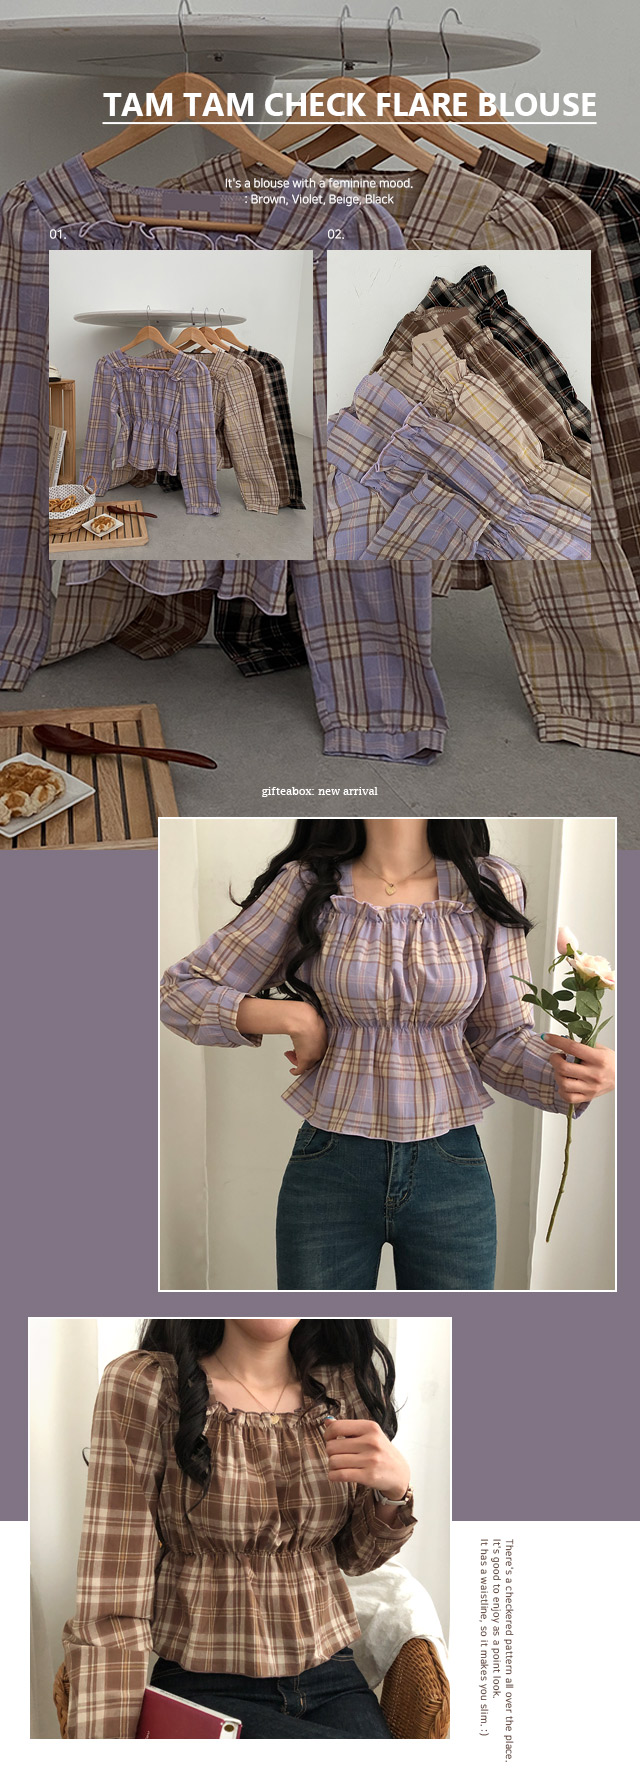 Tam Tam check flared blouse